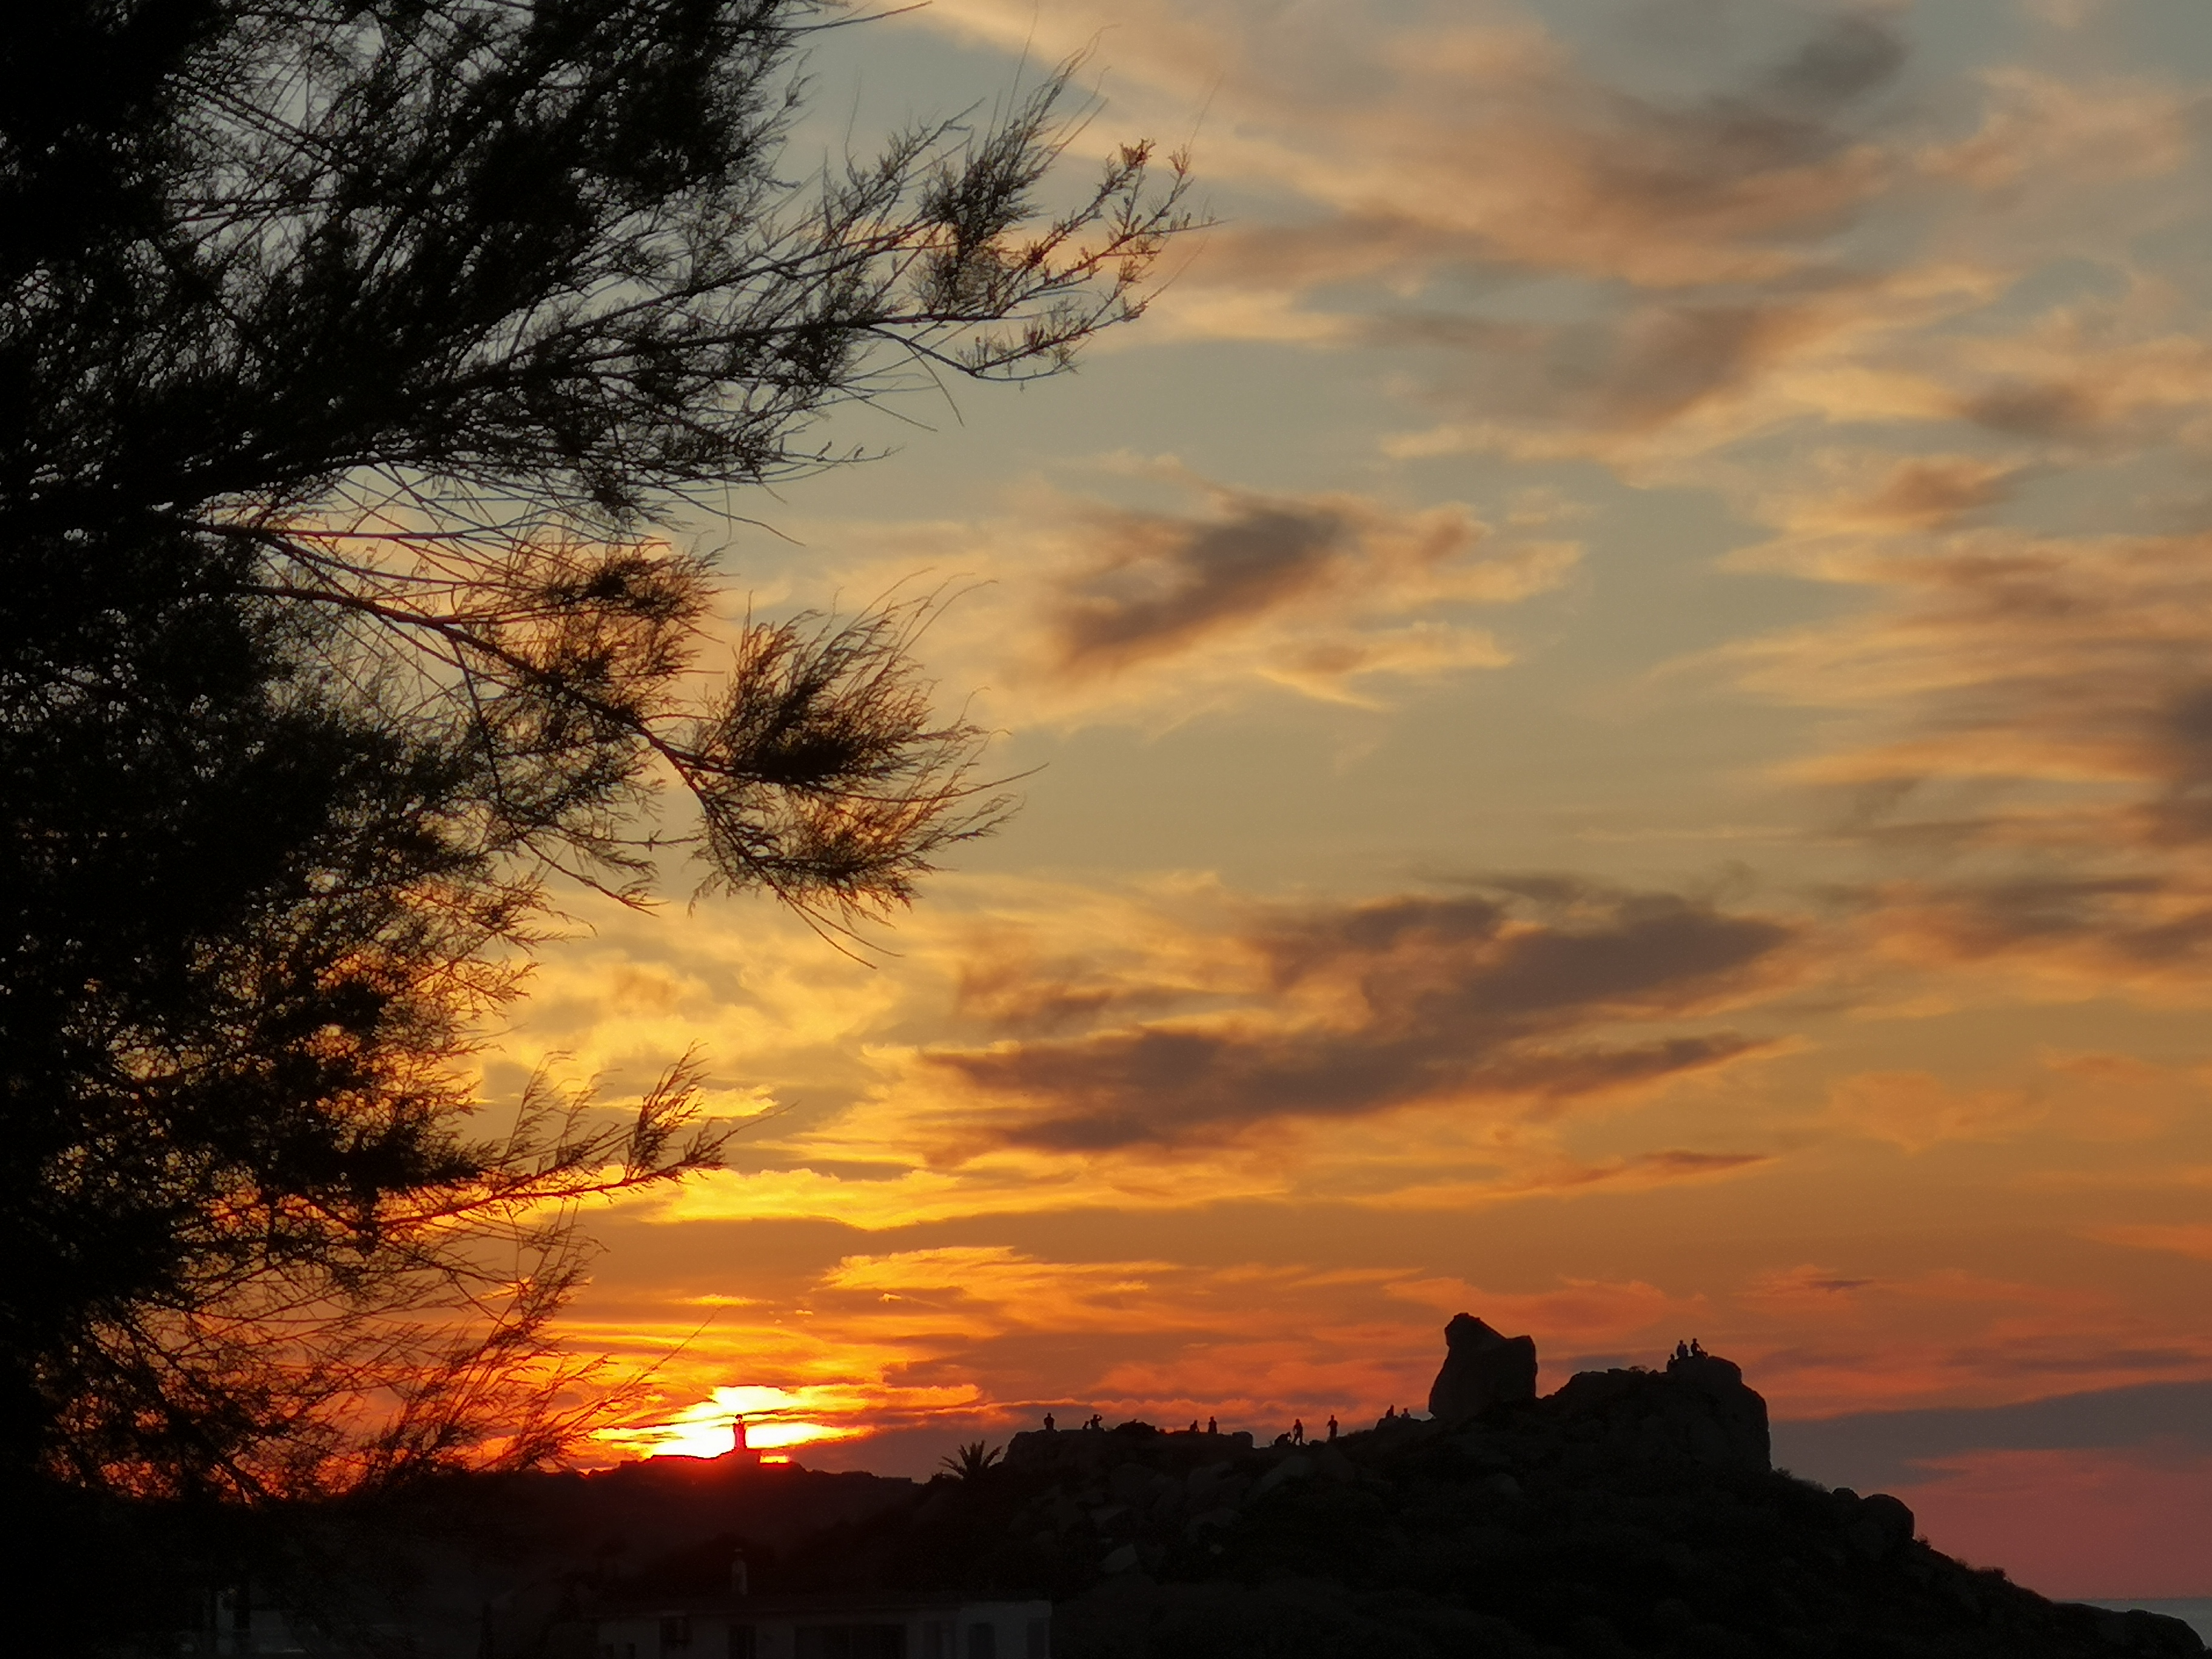 Coucher de Soleil à Calvi (Stéphanie Ingram)